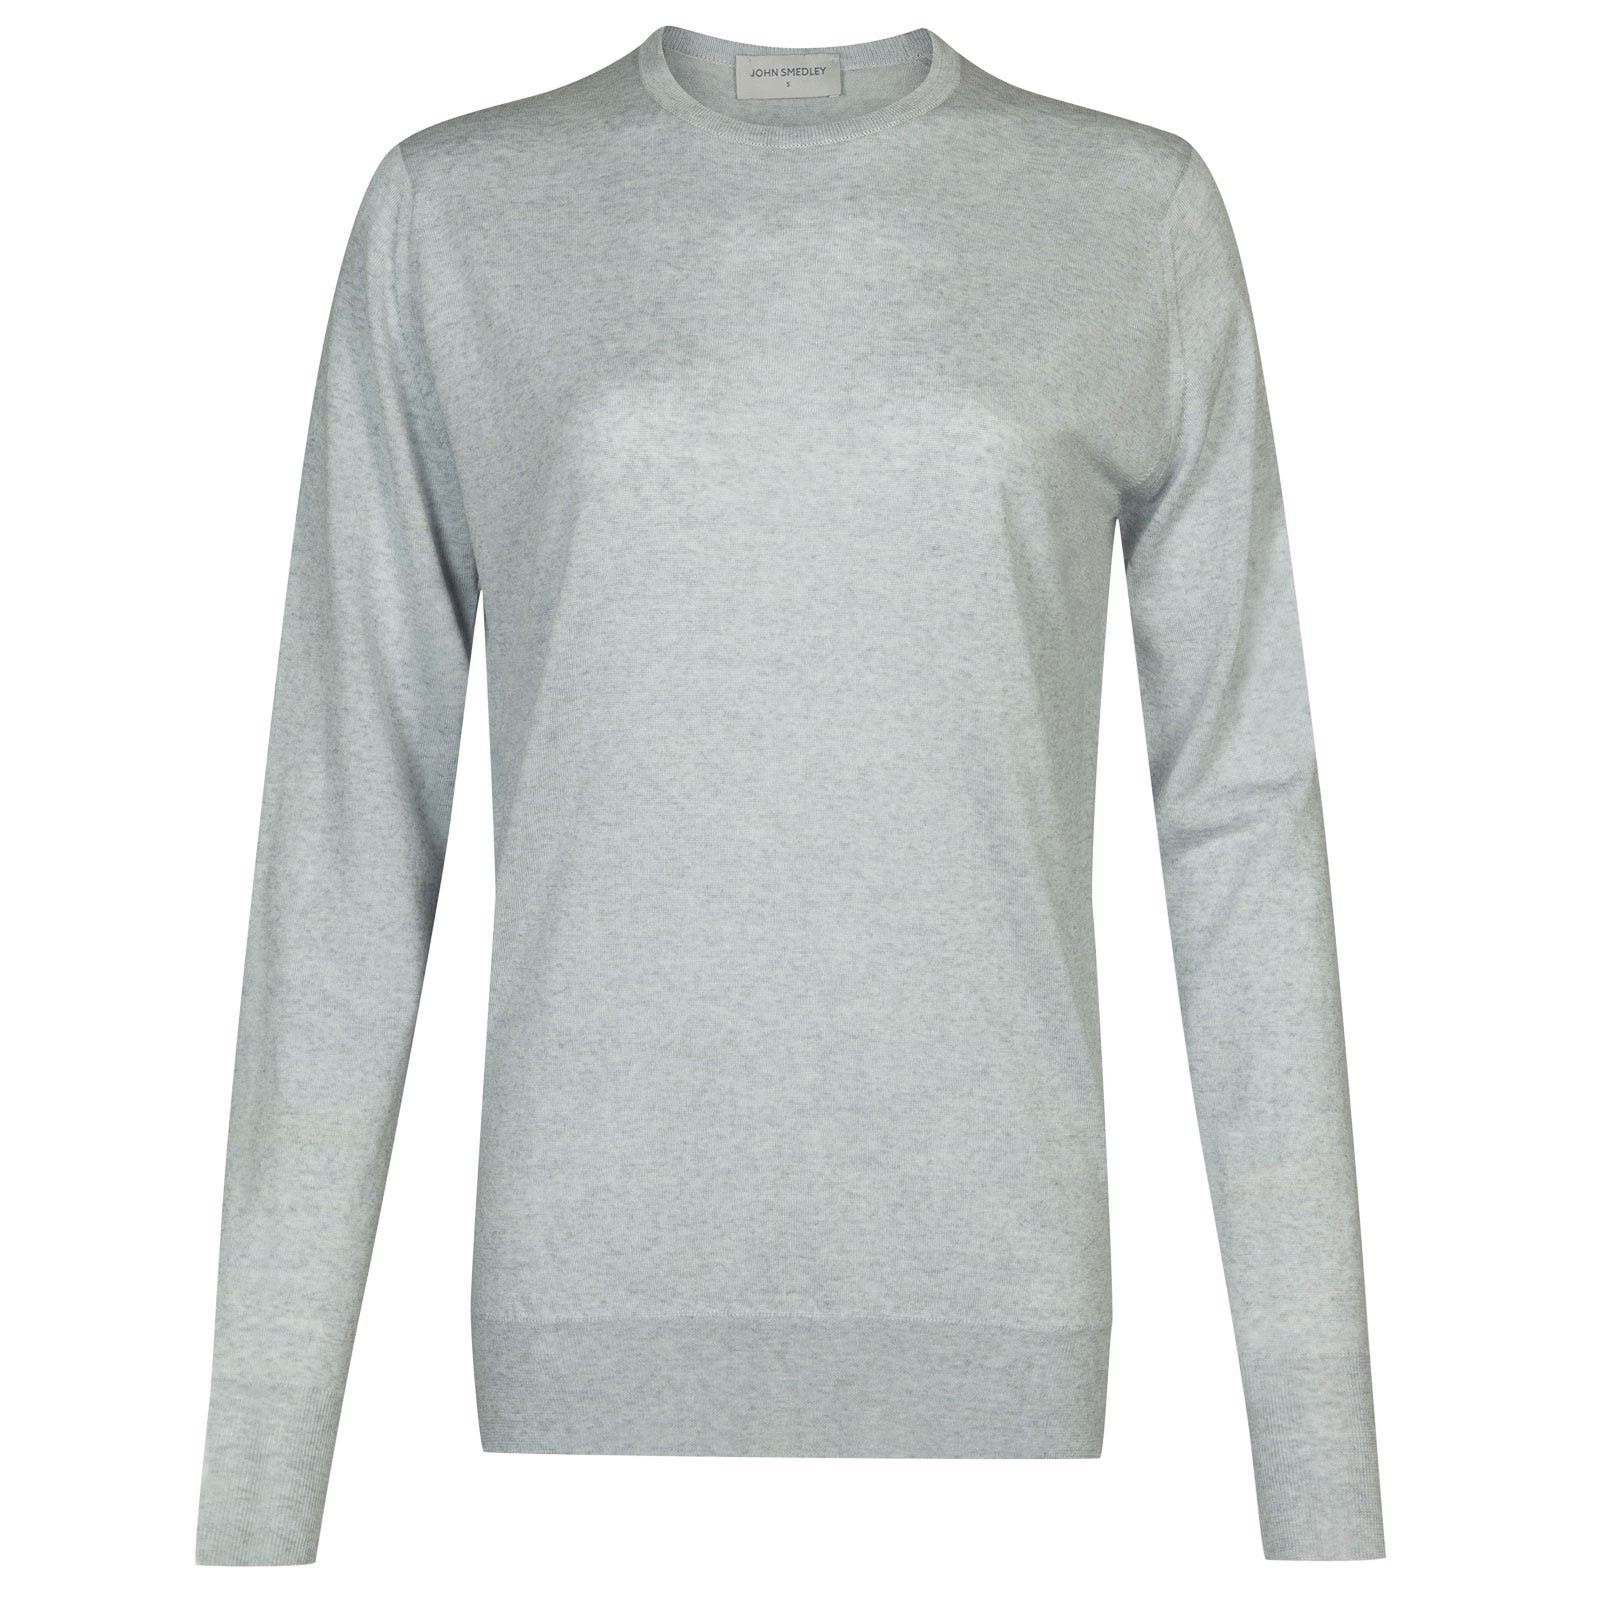 John Smedley Mitzi Merino Wool Sweater in Bardot Grey-M